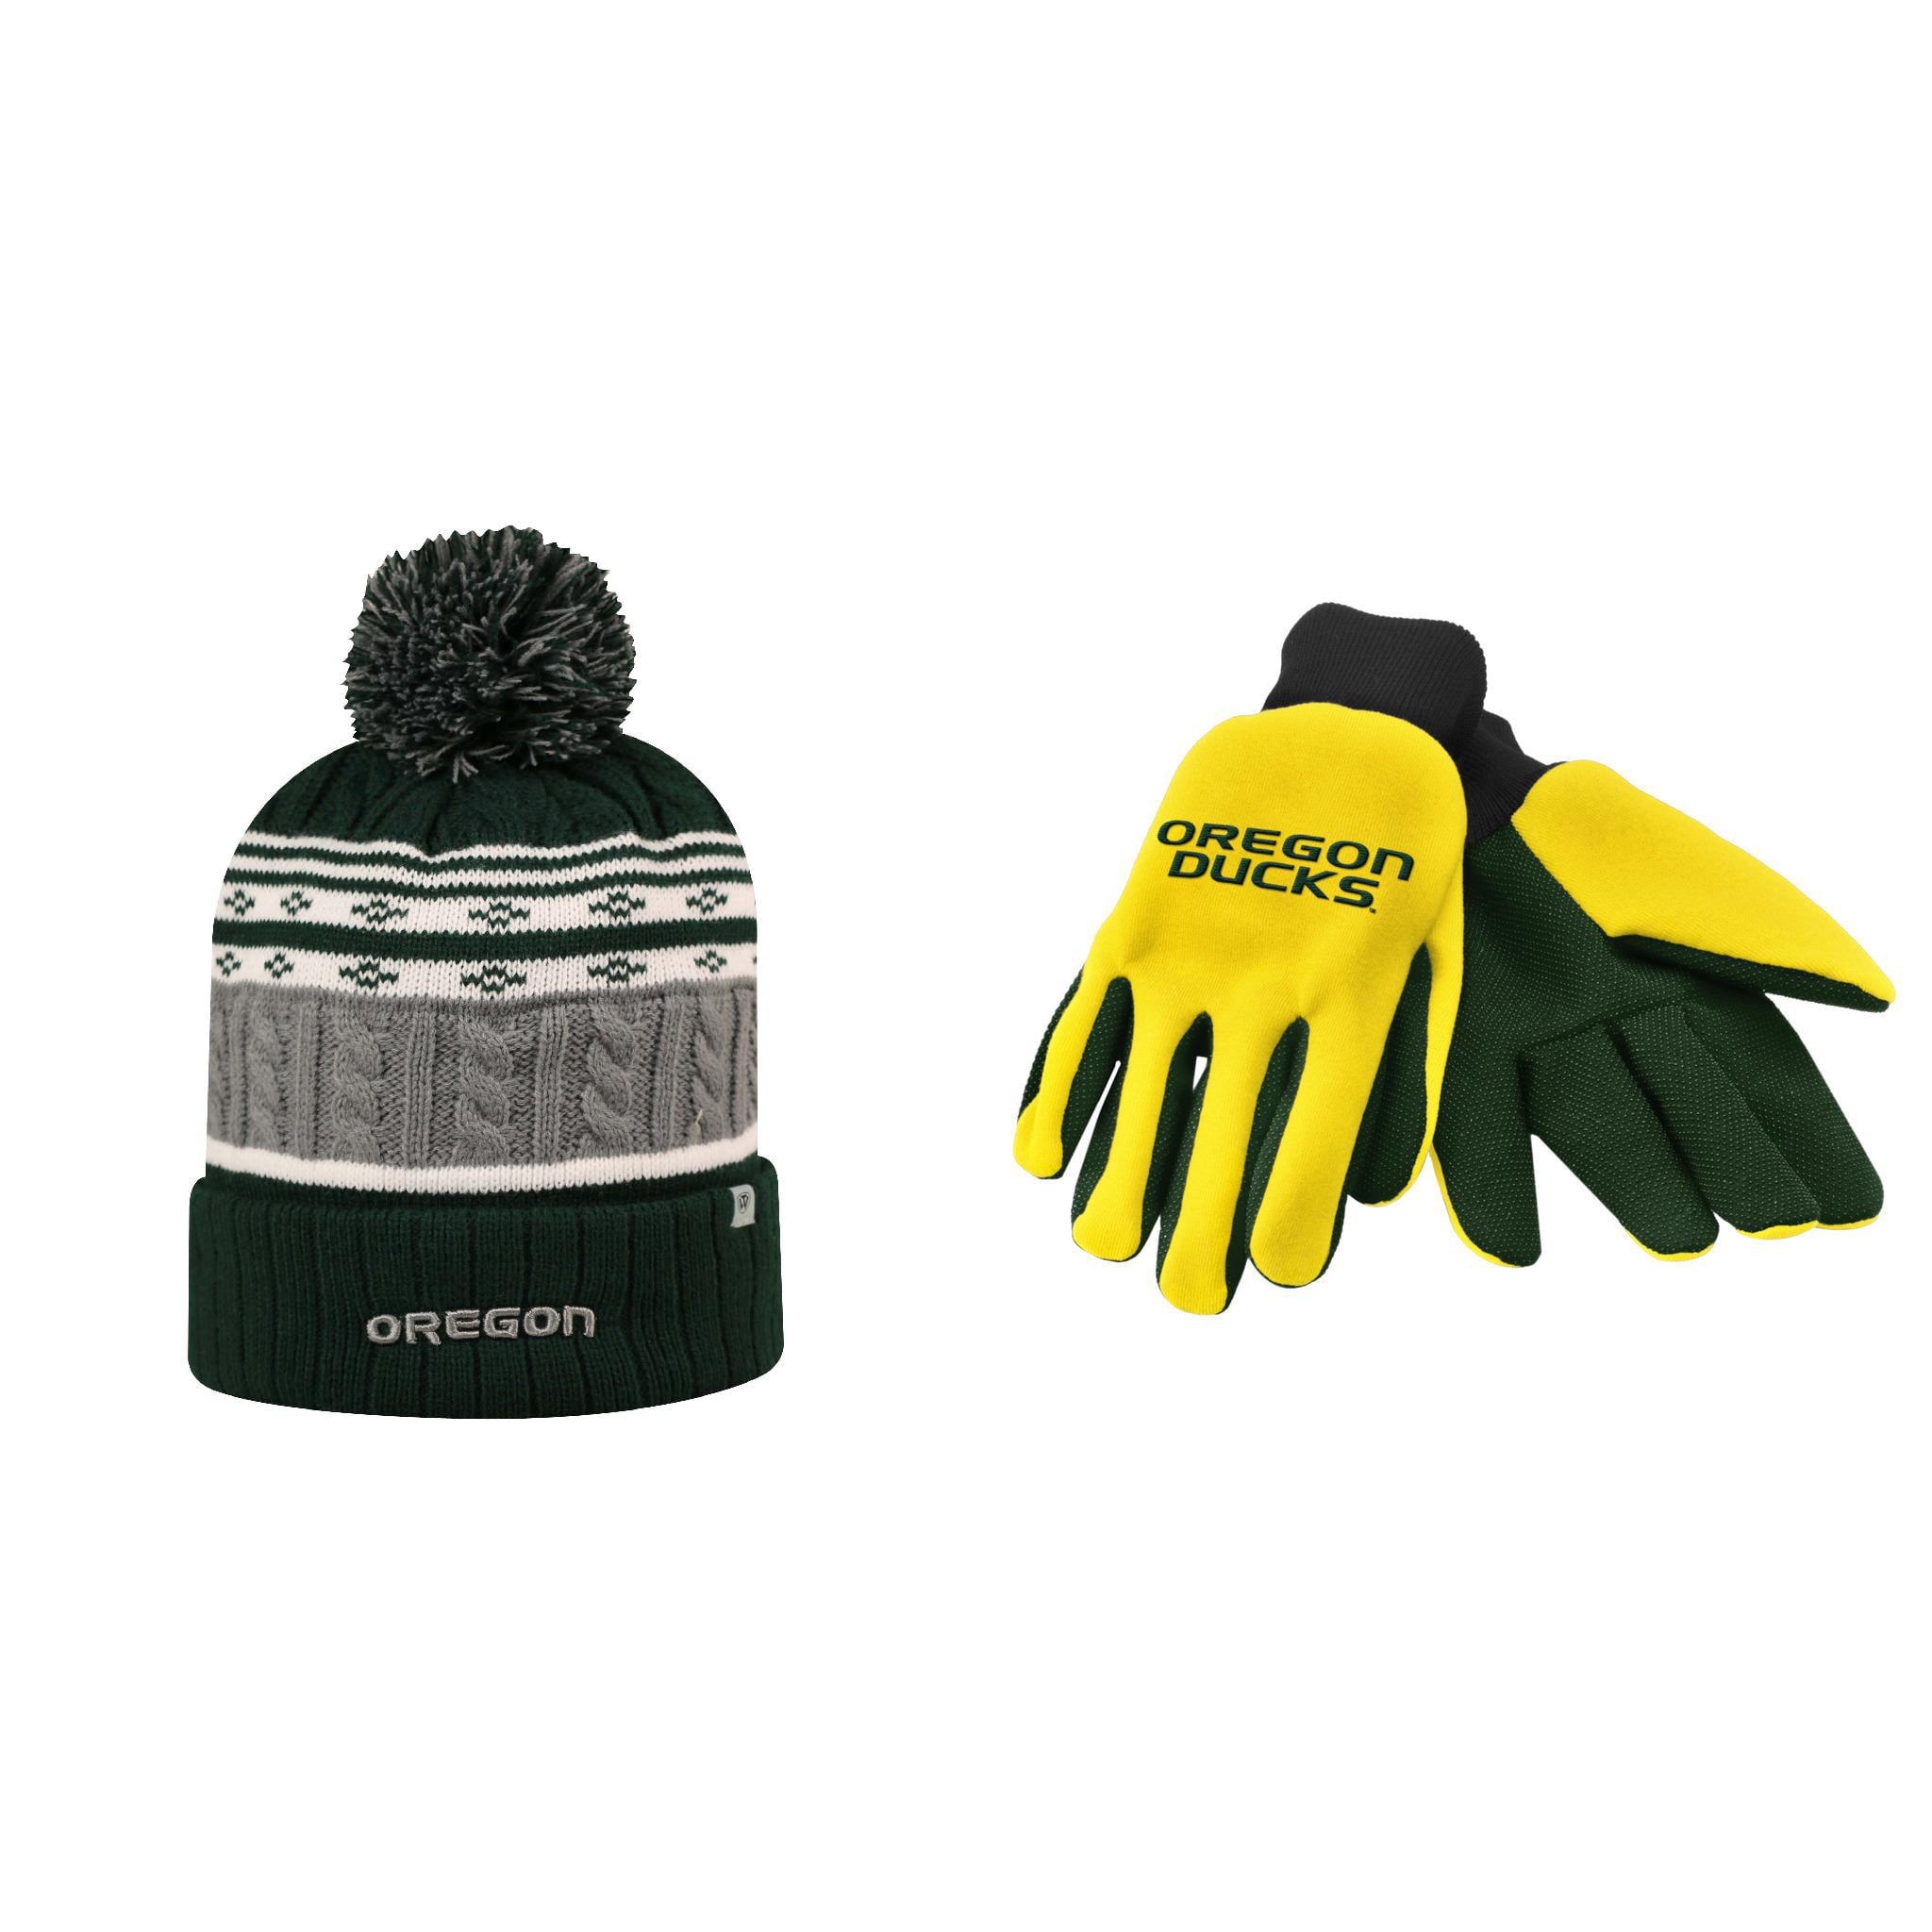 NCAA Oregon Ducks Altitude Beanie Hat And Grip Work Glove 2 Pack Bundle